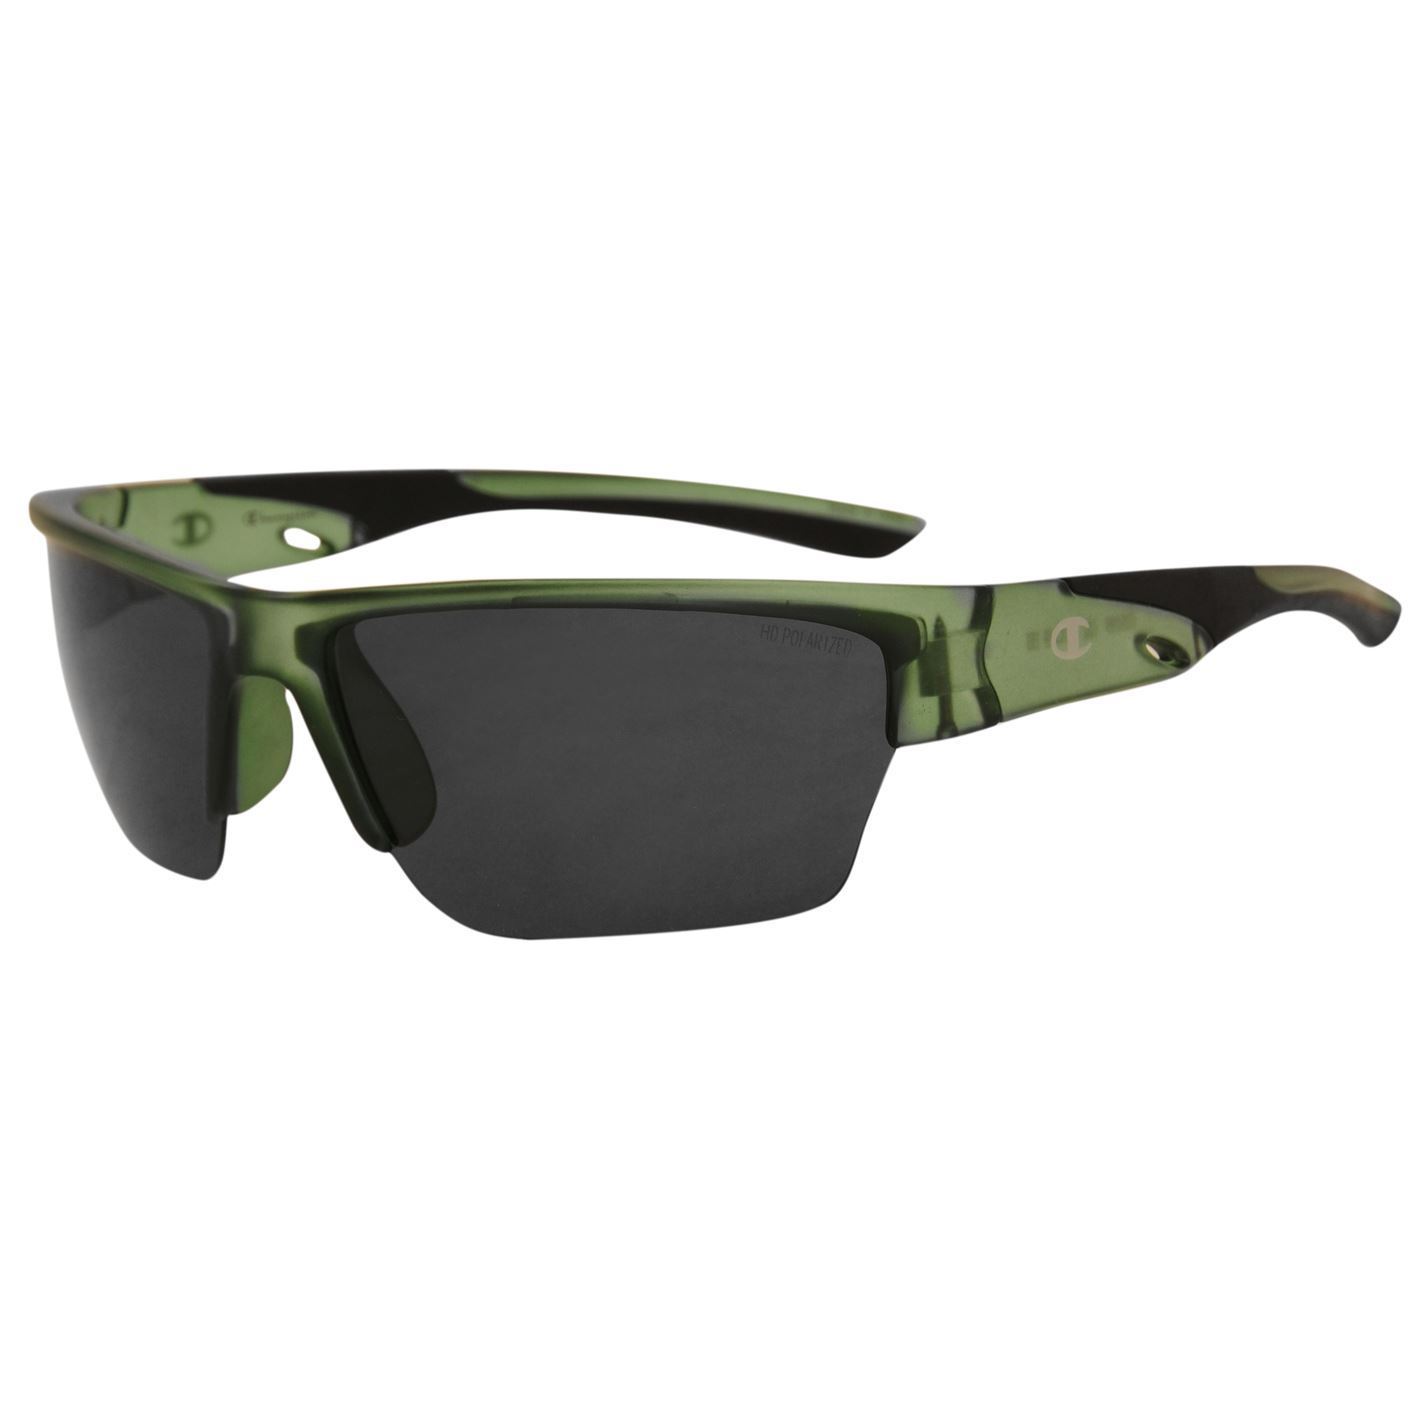 Champion-CU5099-Sunglasses-Mens-Gents-UPF-Sport-Reflected-Glare-Reducing